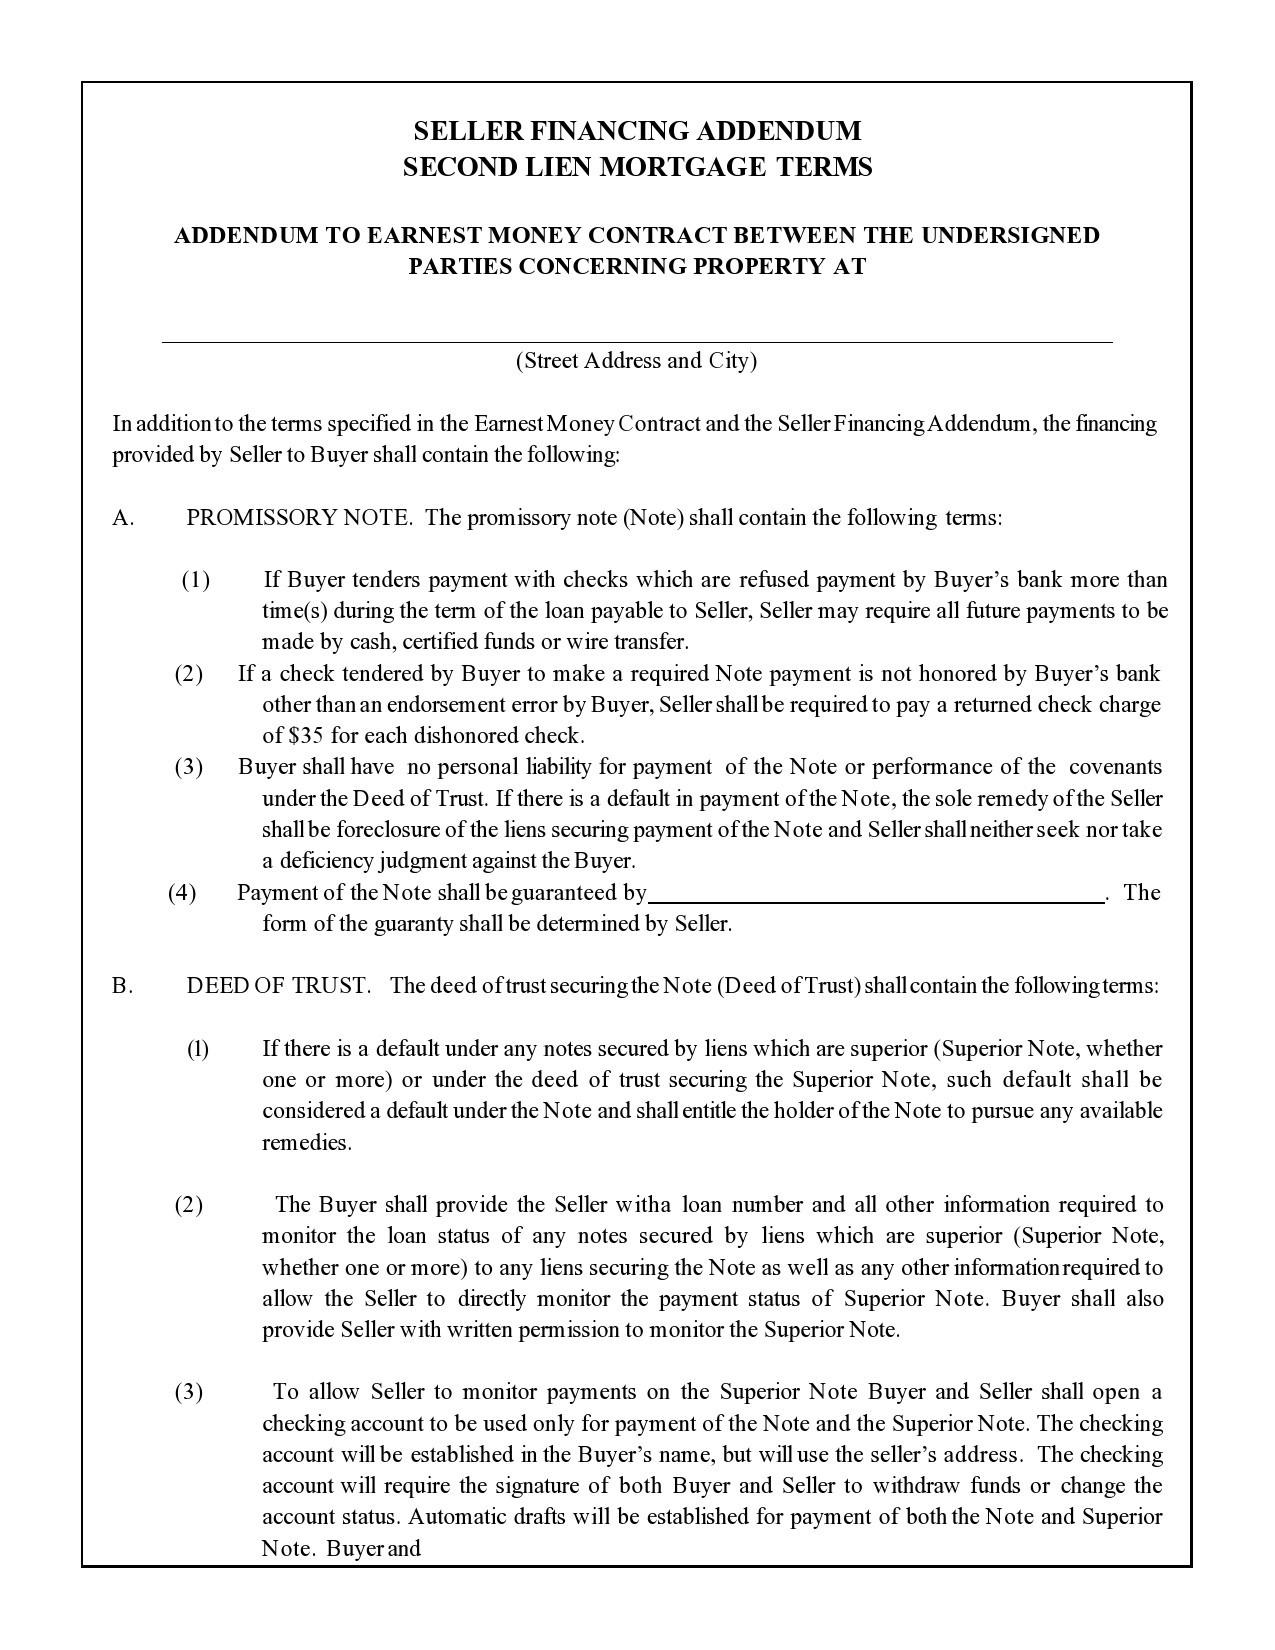 Free seller financing addendum 21